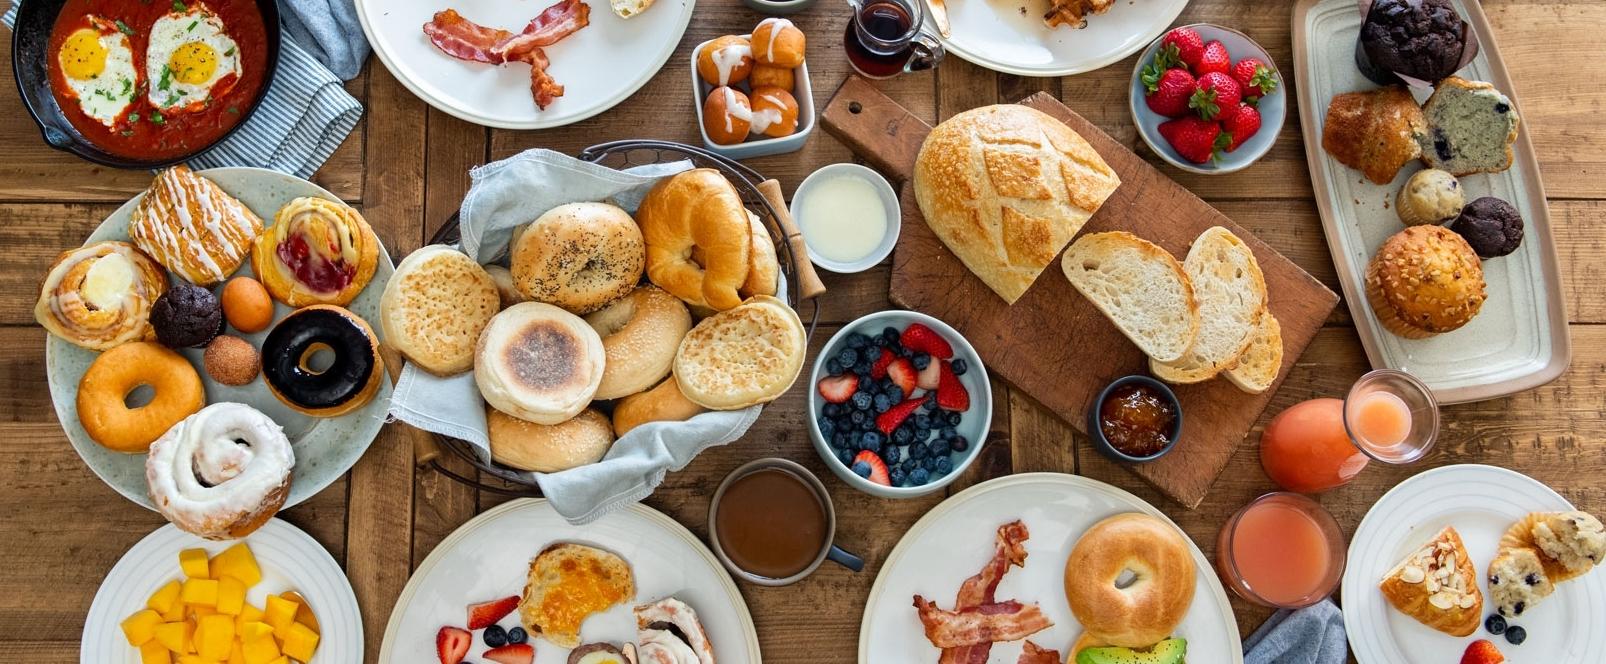 aspire foods brunch table